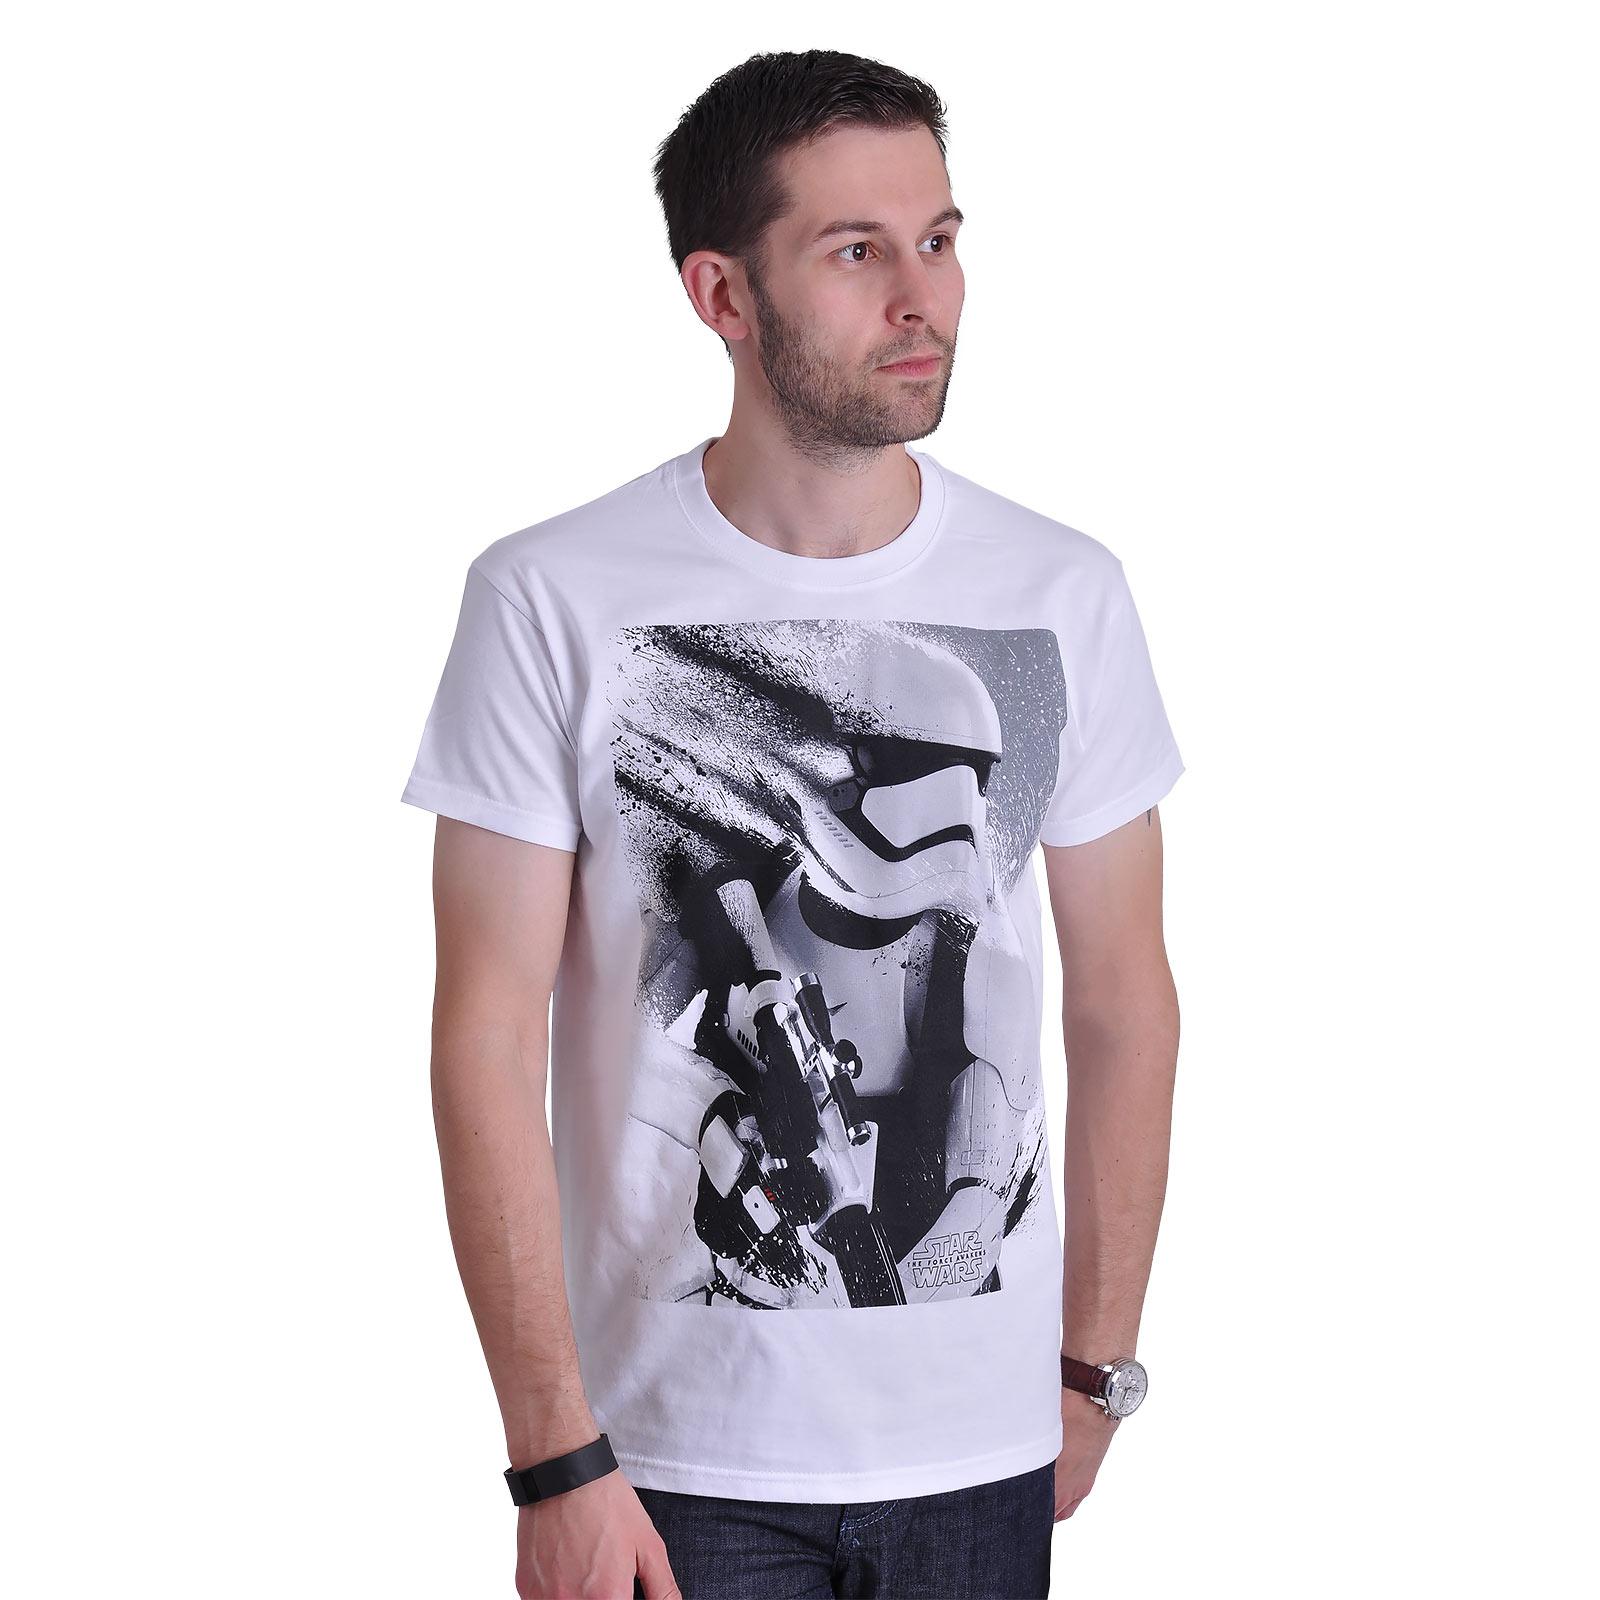 Star Wars - Stormtrooper Splatter T-Shirt weiß